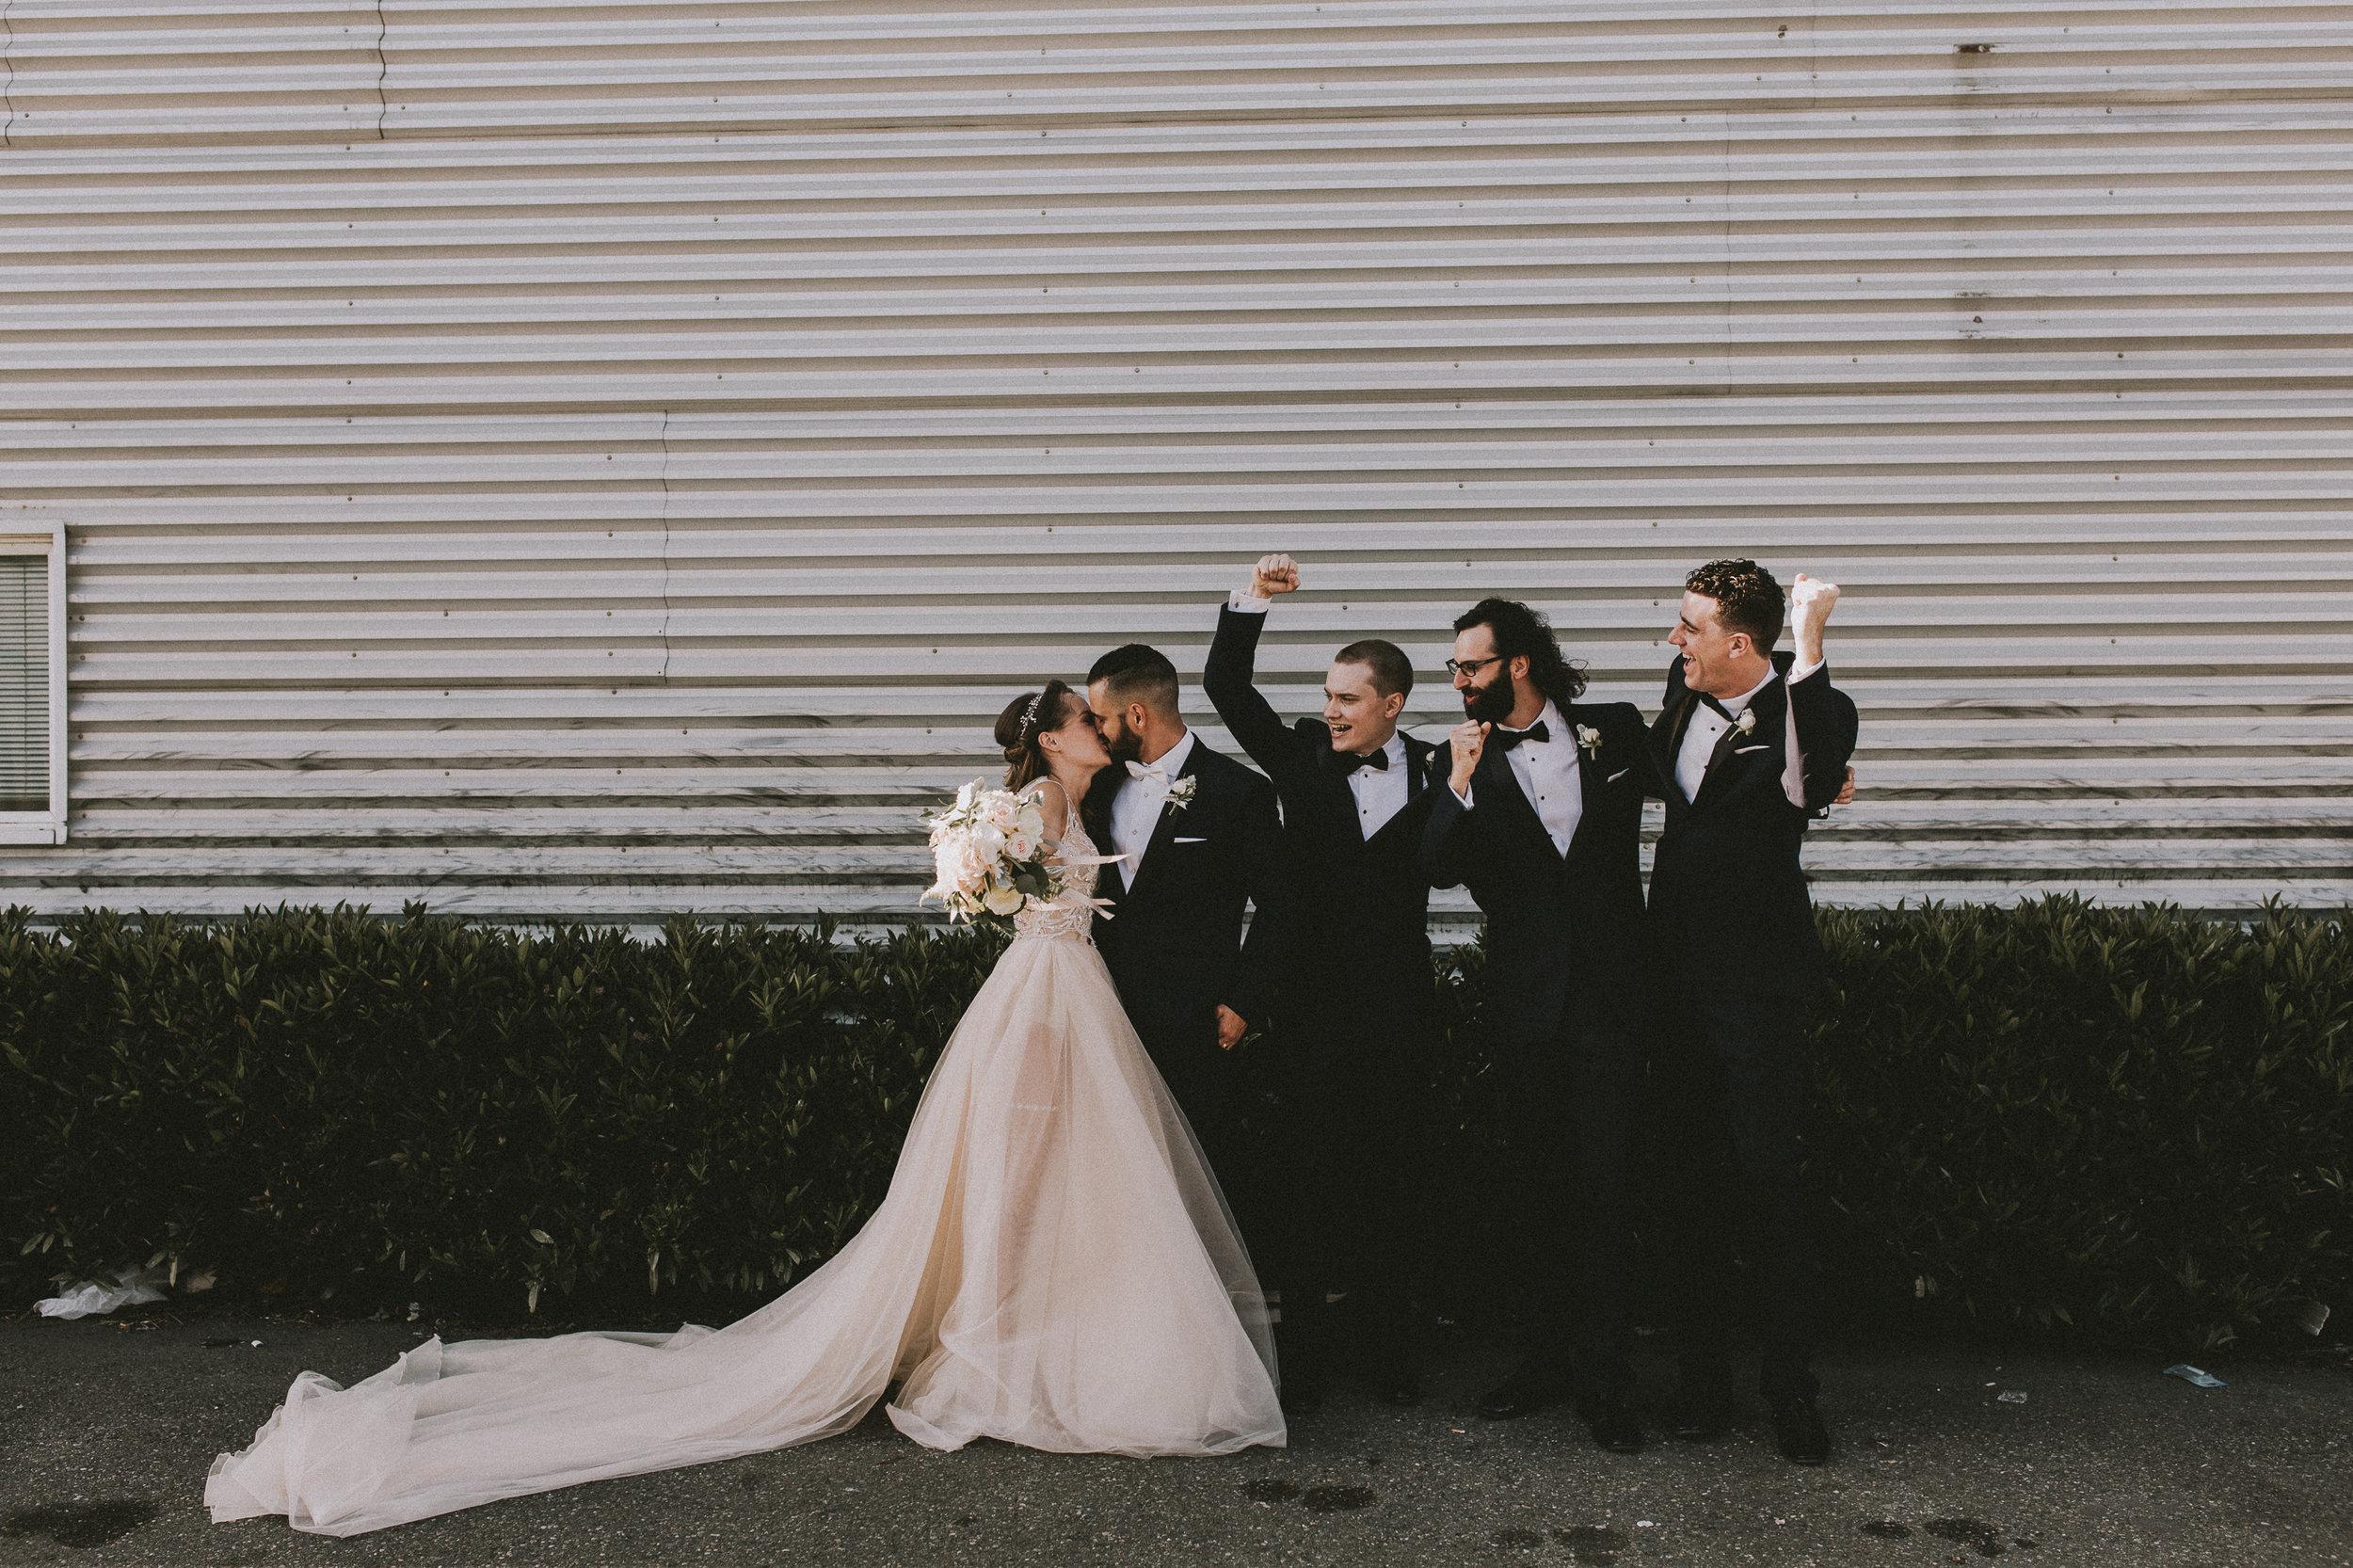 SAMLANDRETH-bridals-43.jpg